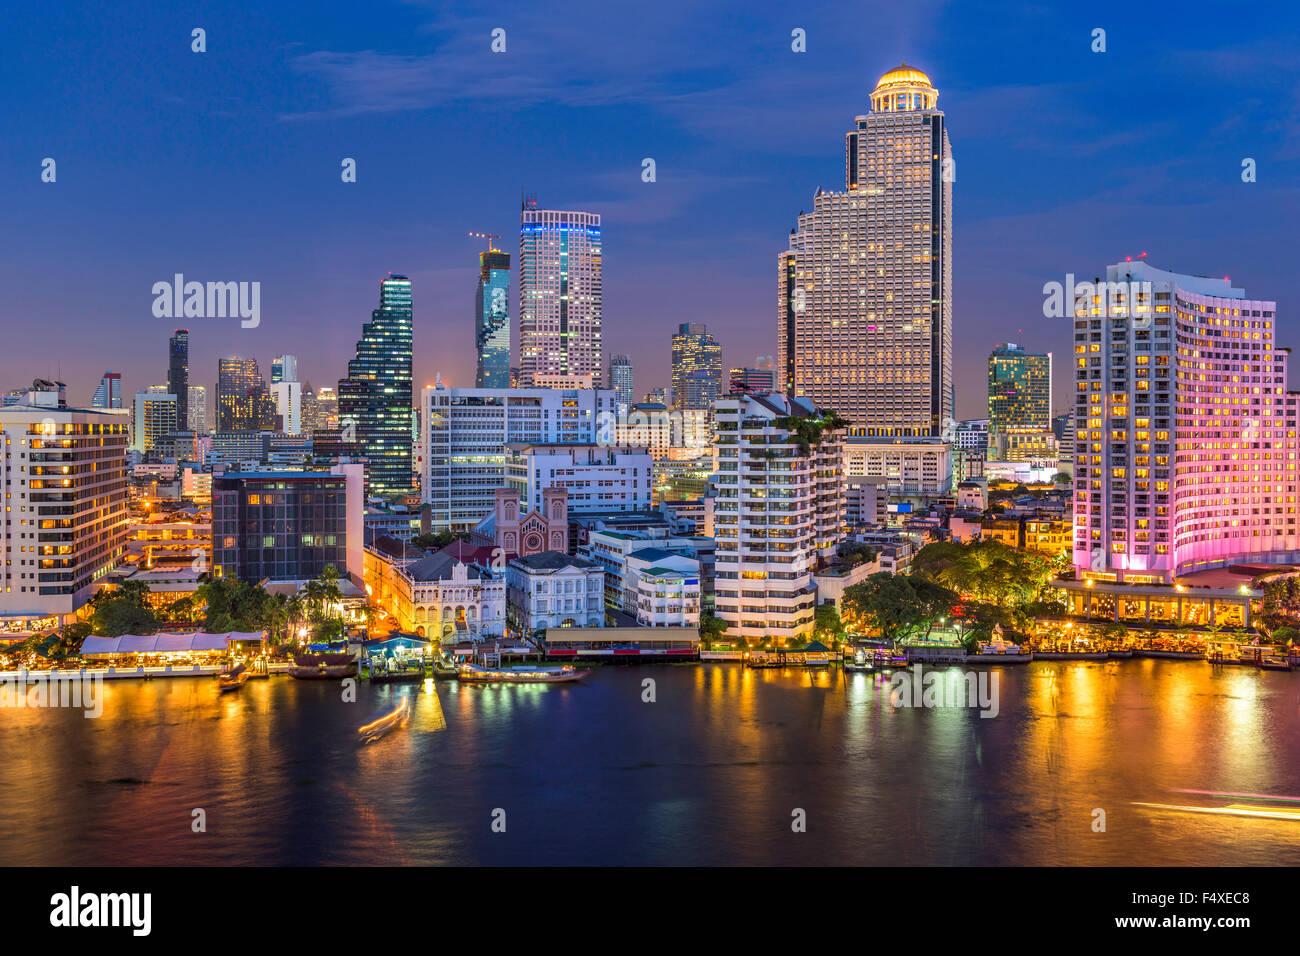 Bangkok, Thailand skyline on the Chao Phraya River. - Stock Image